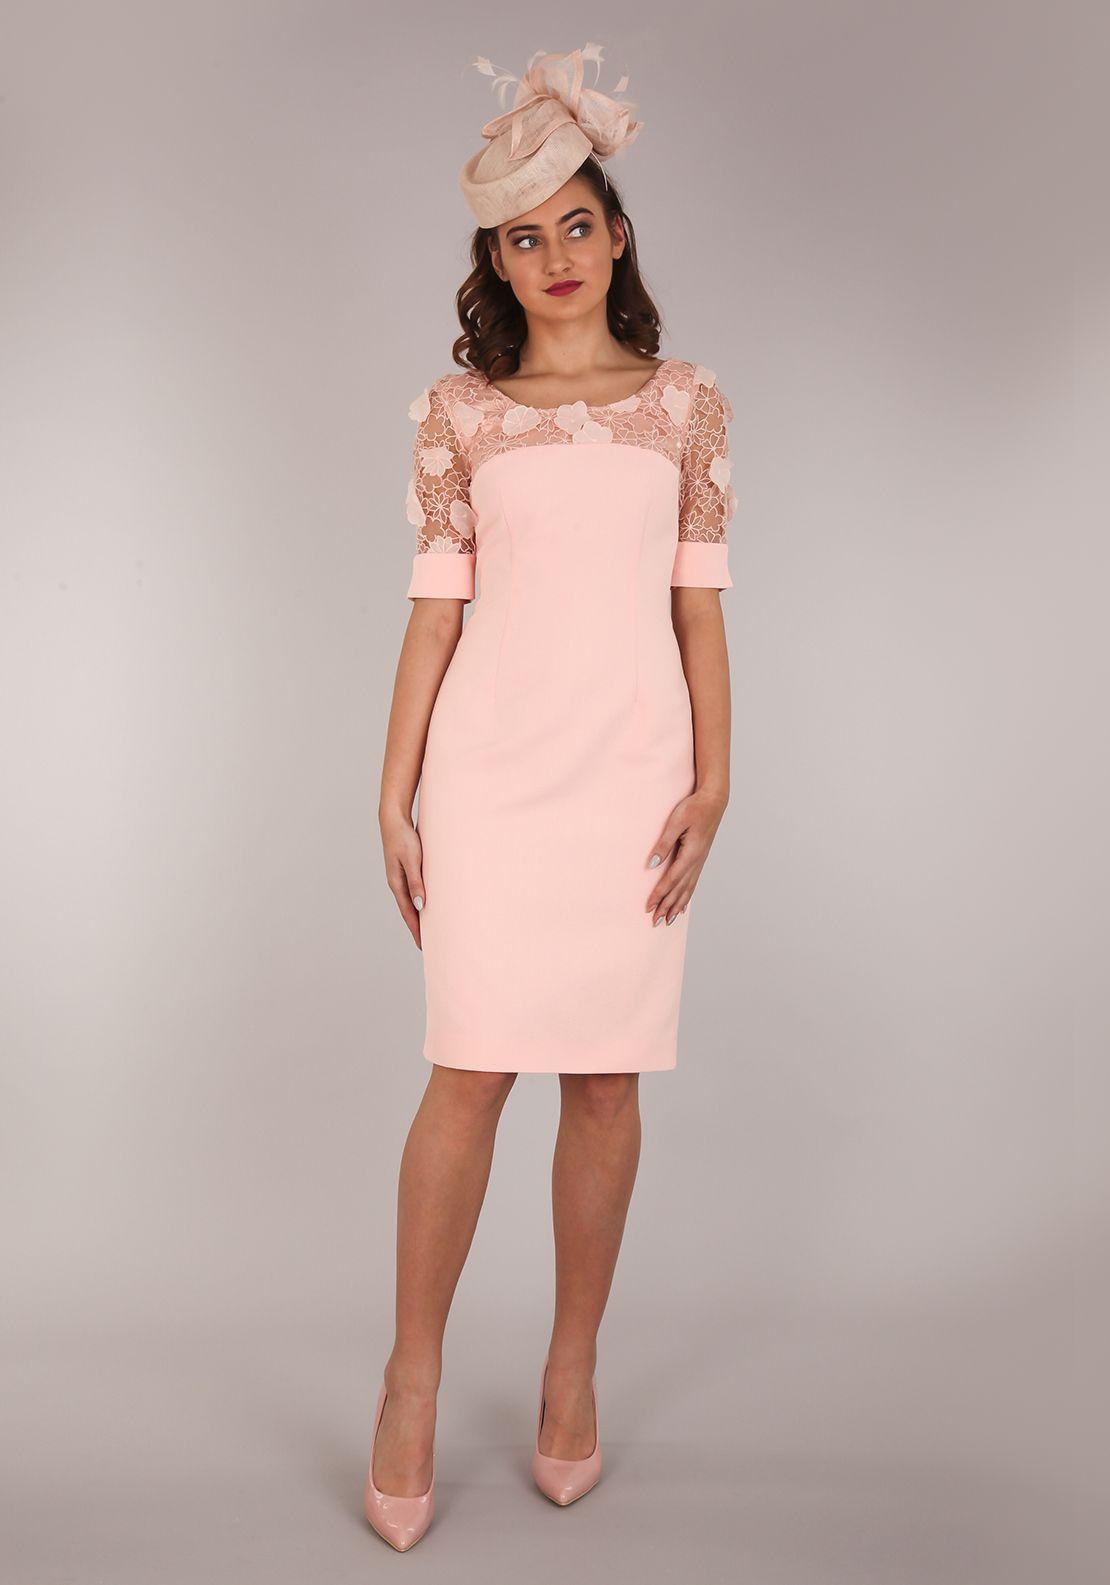 Aideen Bodkin Guava Pencil Dress, Apricot Pink   altinn   Pinterest